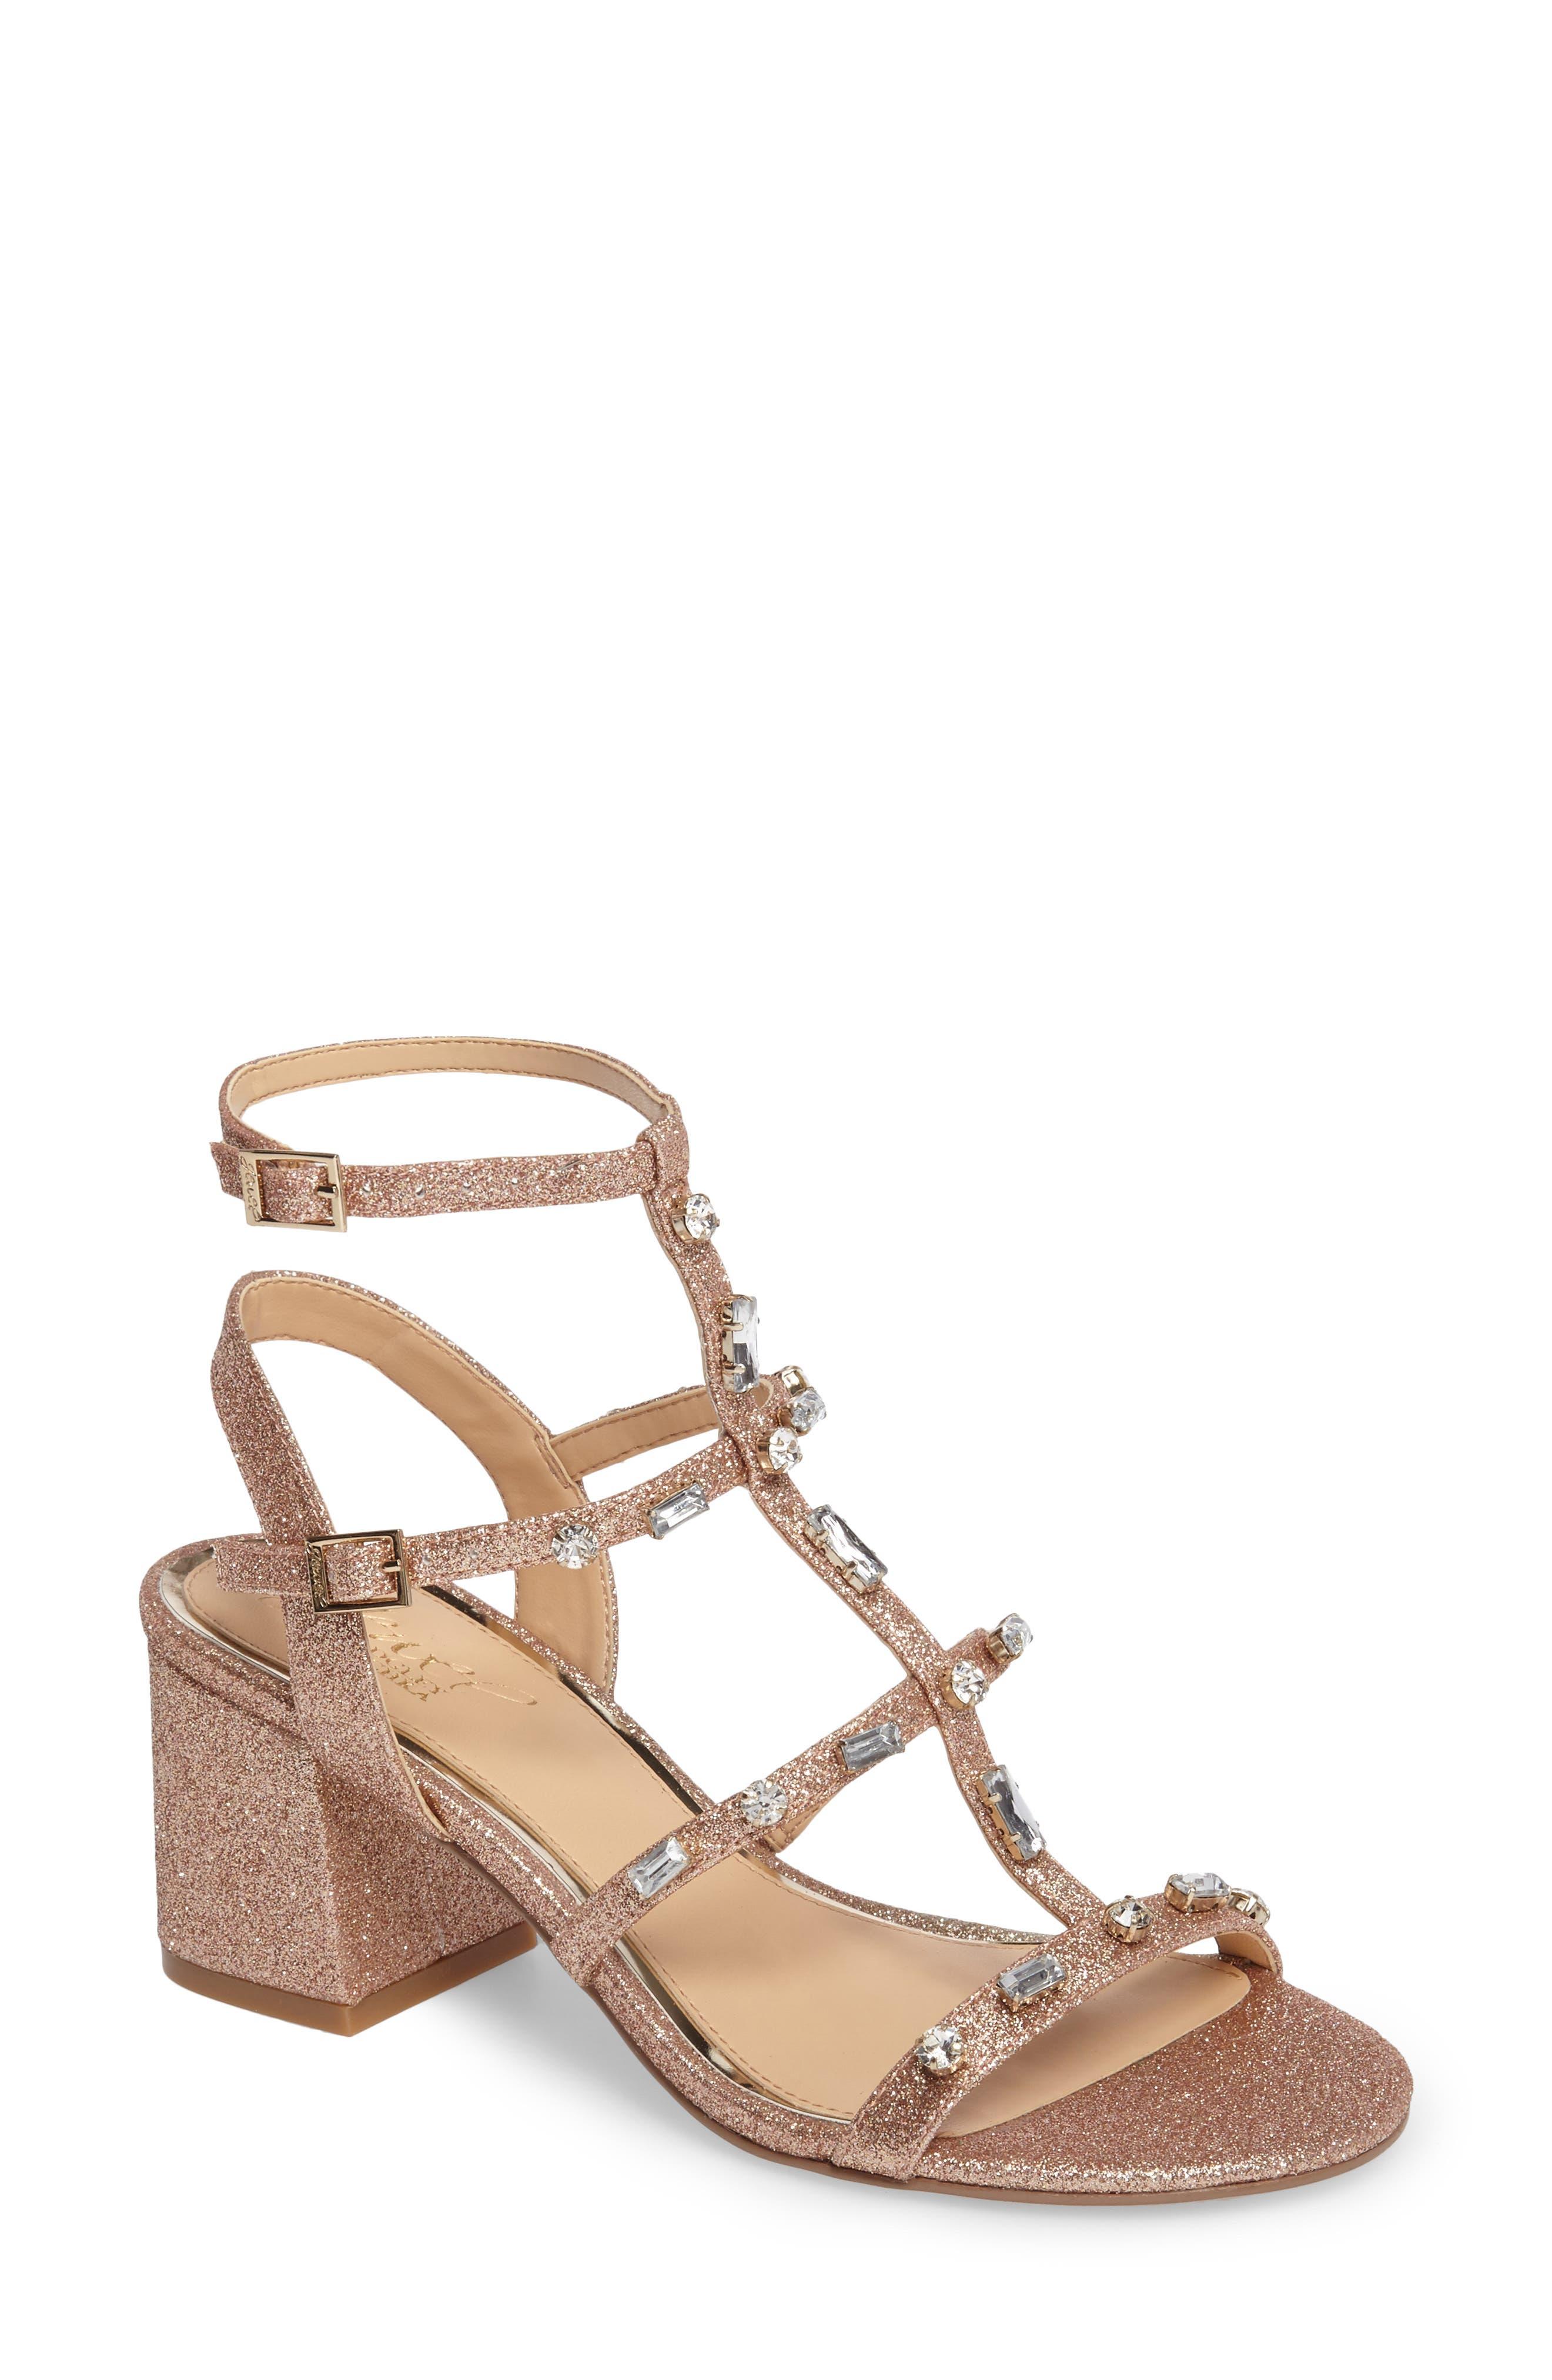 Jewel Badgley Mischka Ana Crystal Studded Block Heel Sandal (Women)